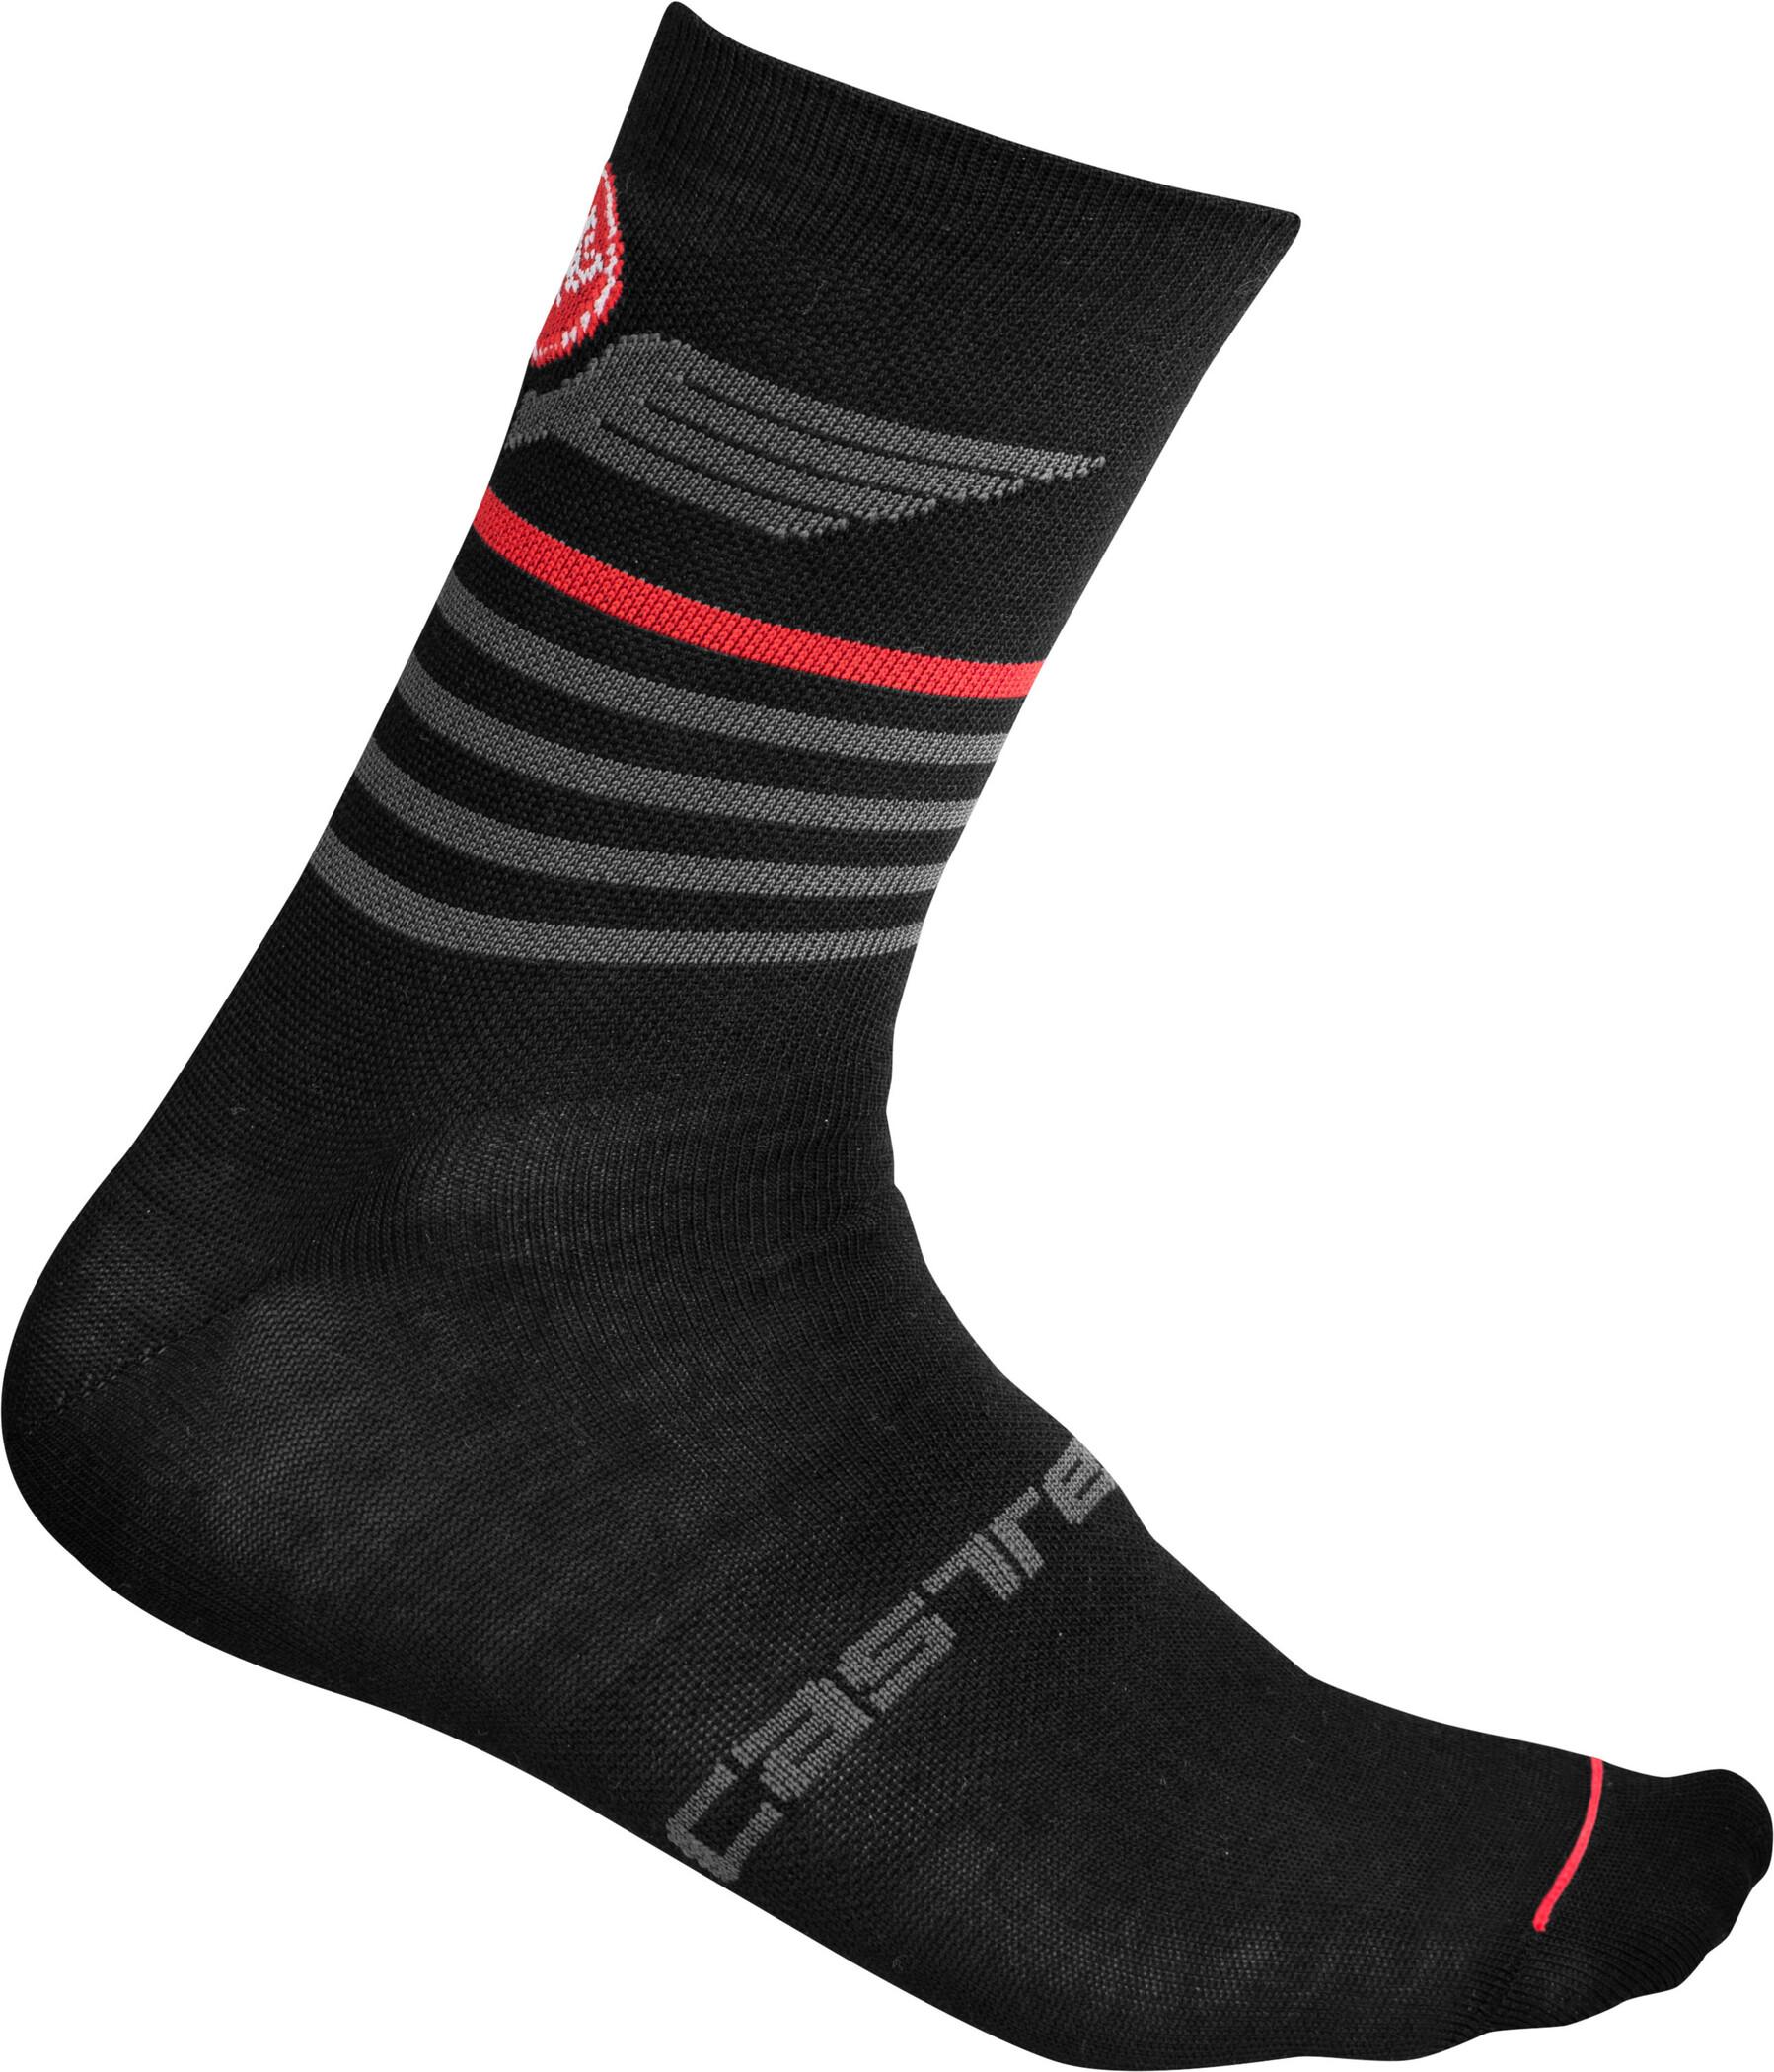 Castelli Lancio 15 Cycling Socks | Socks